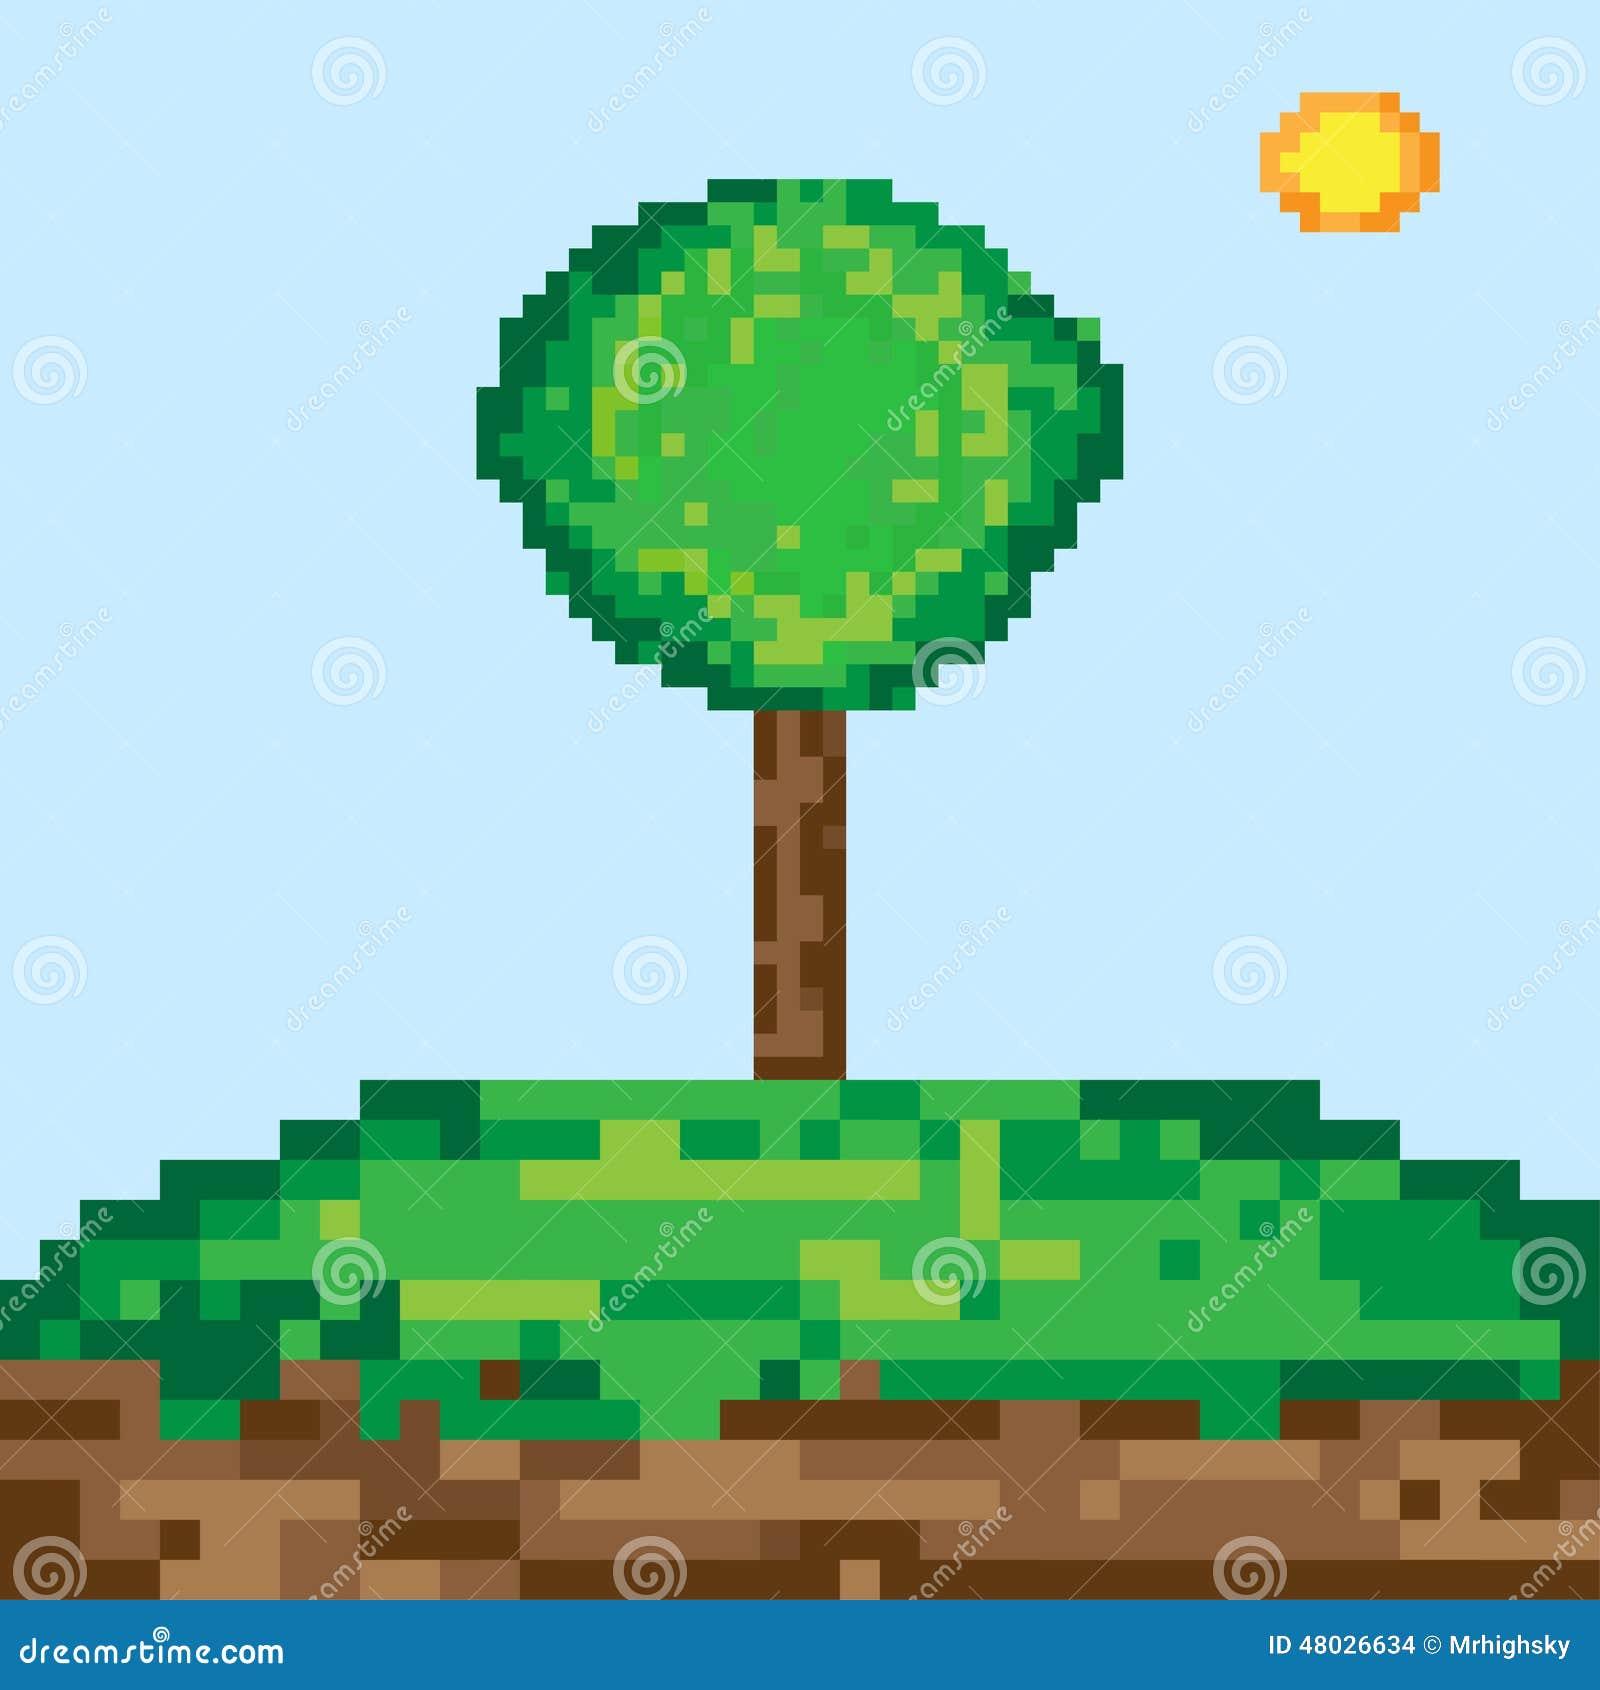 arbre d 39 art de pixel illustration de vecteur image 48026634. Black Bedroom Furniture Sets. Home Design Ideas